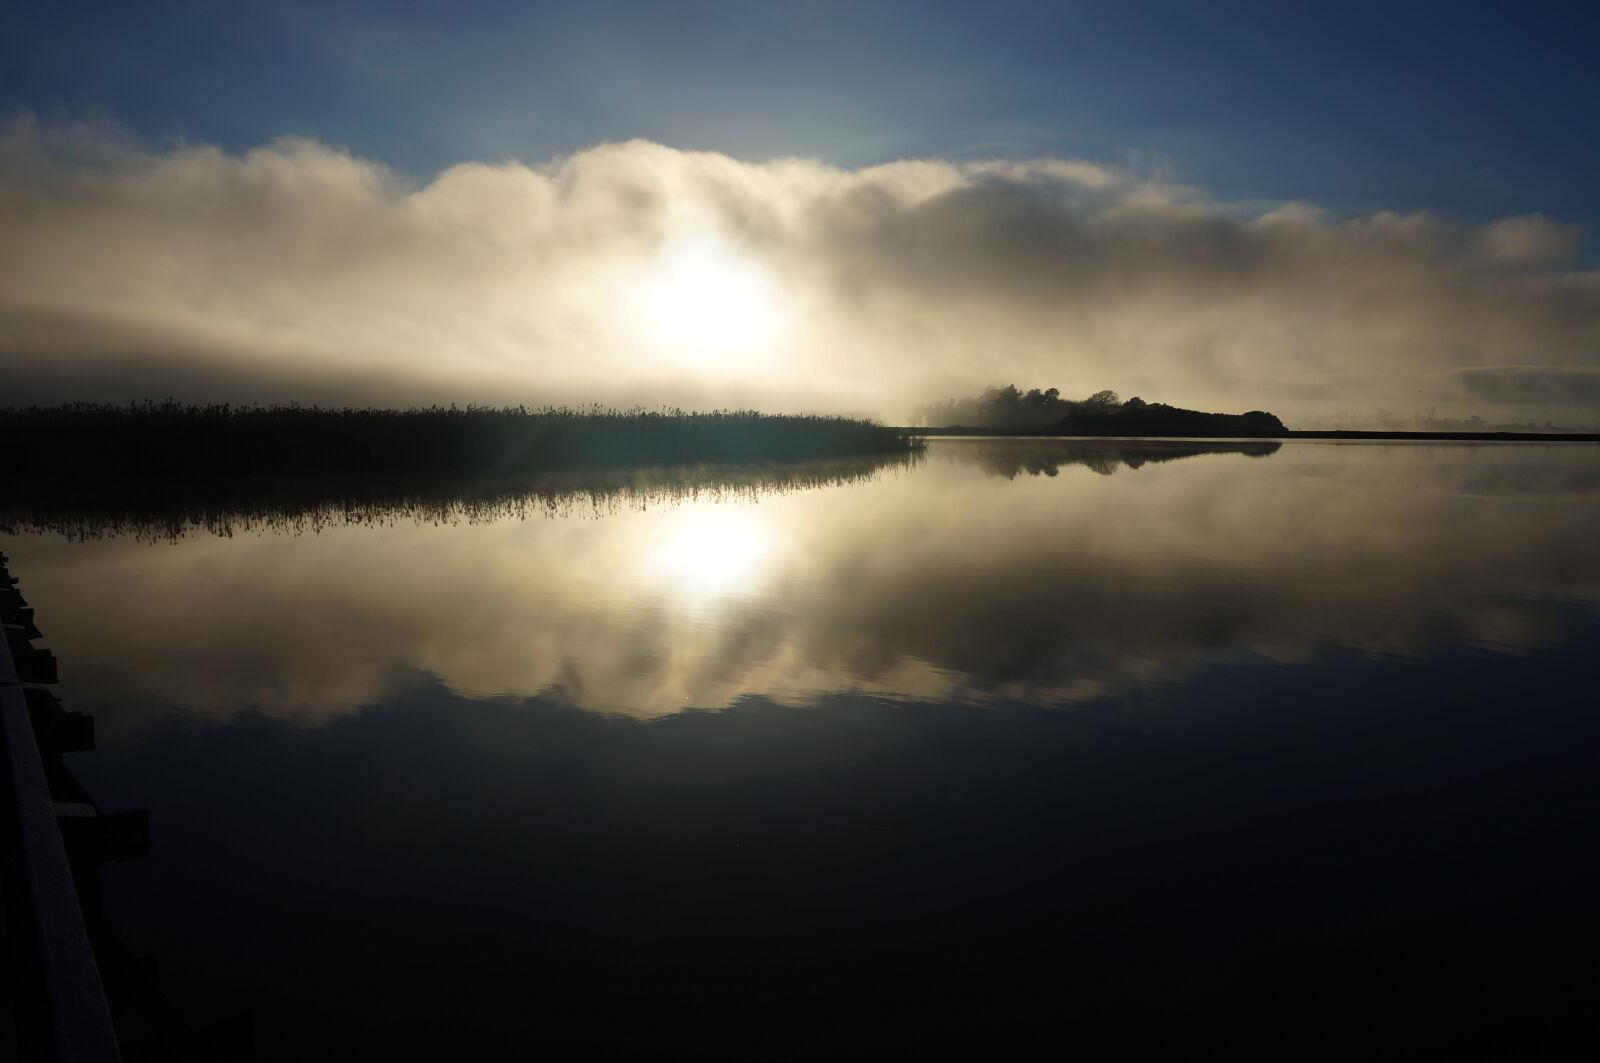 fog, mist, reflections